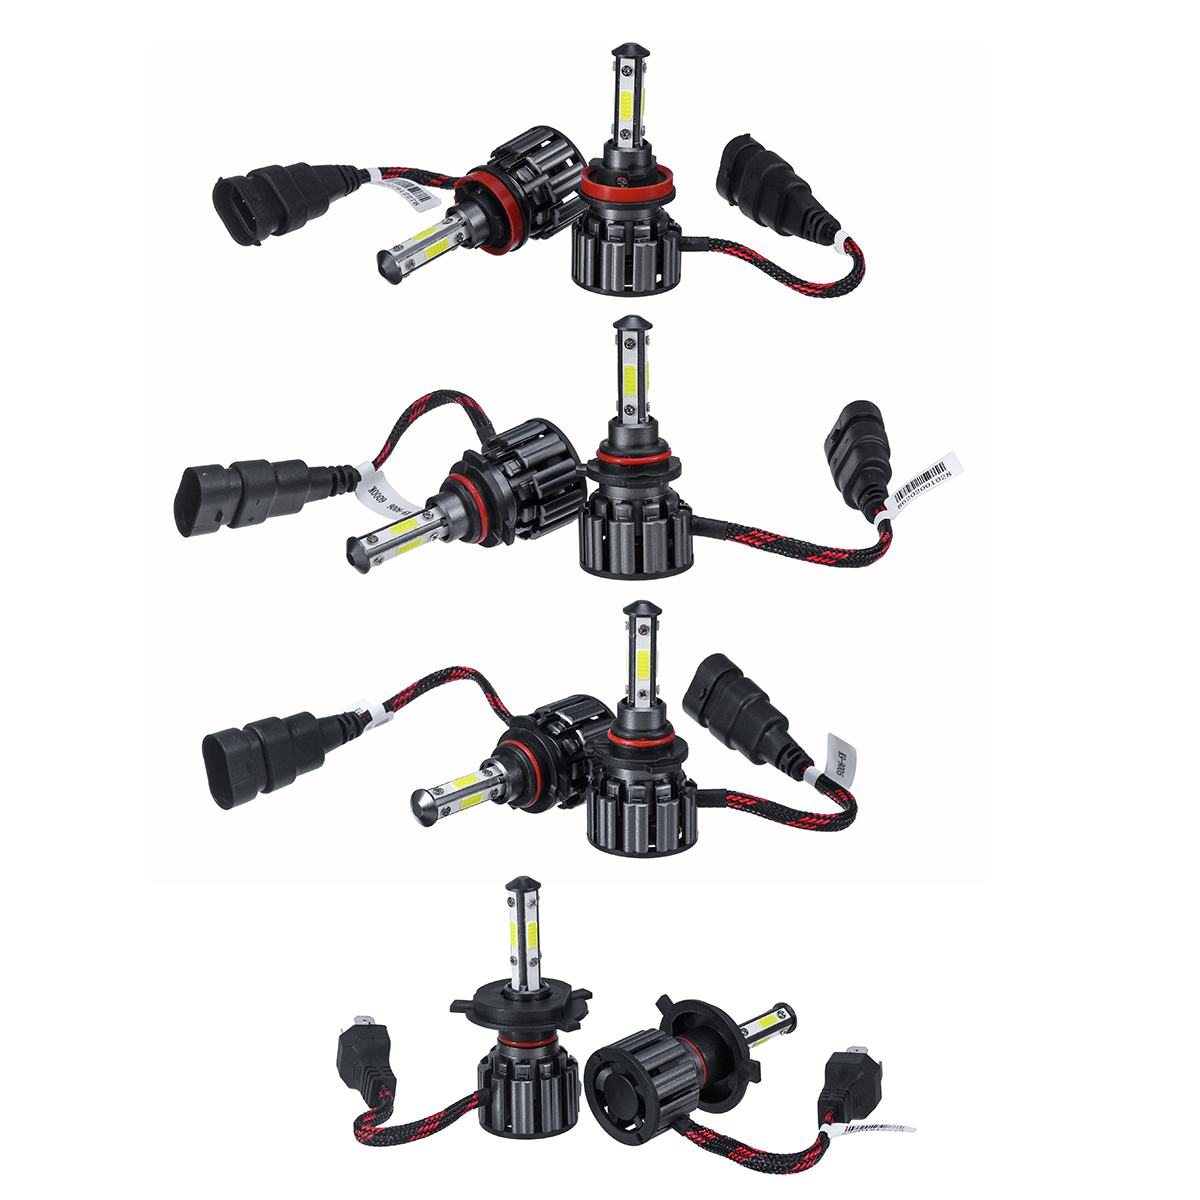 2Pcs 40W 8000LM 6000K H4/H7/9005/9006/H11 LED Headlights Bulbs High And Low Beam Bright 4-Side 9-36V IP68